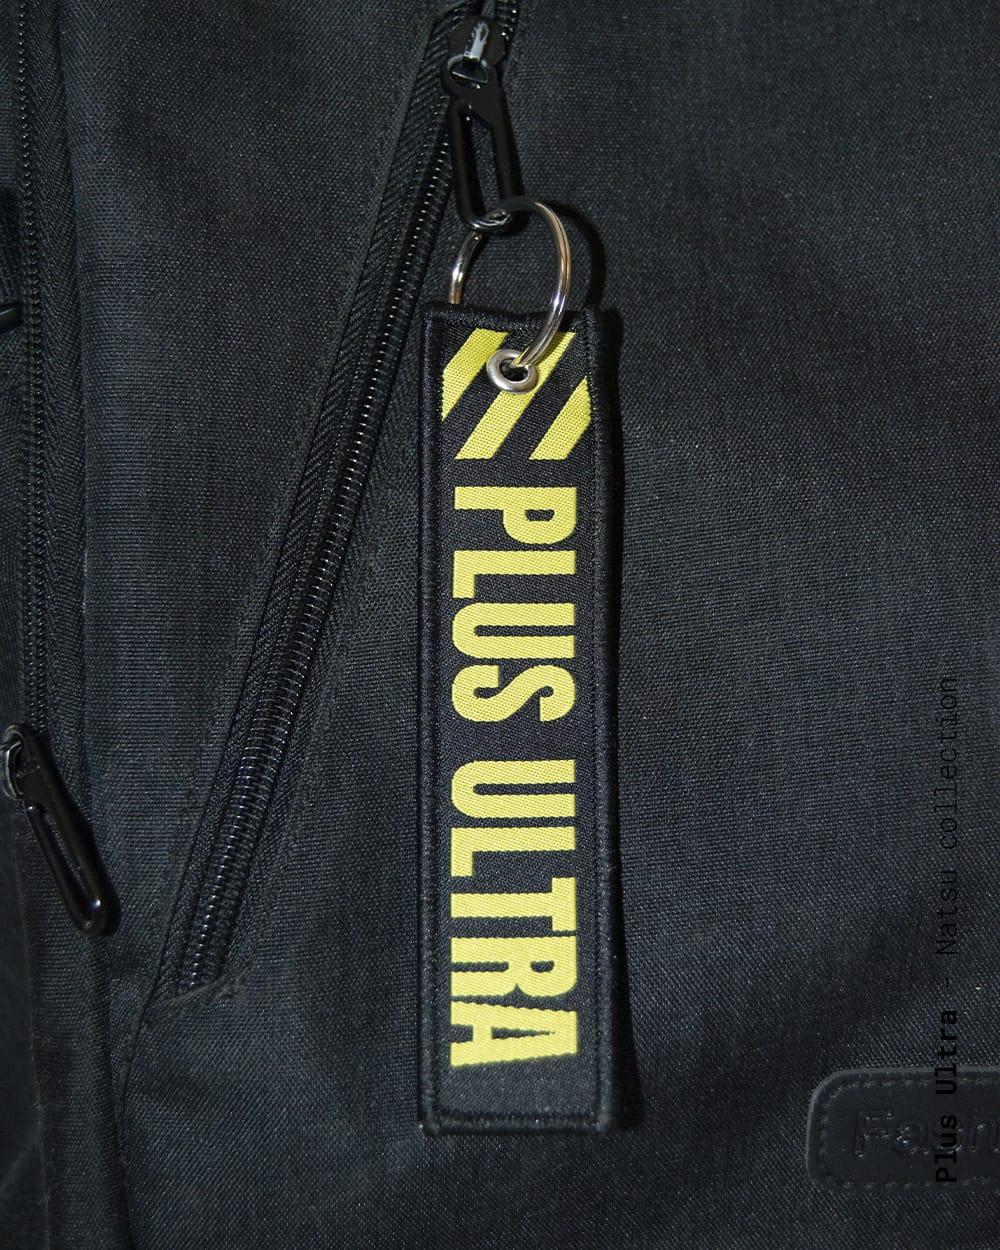 Porte clé inspiré de My Hero Academia